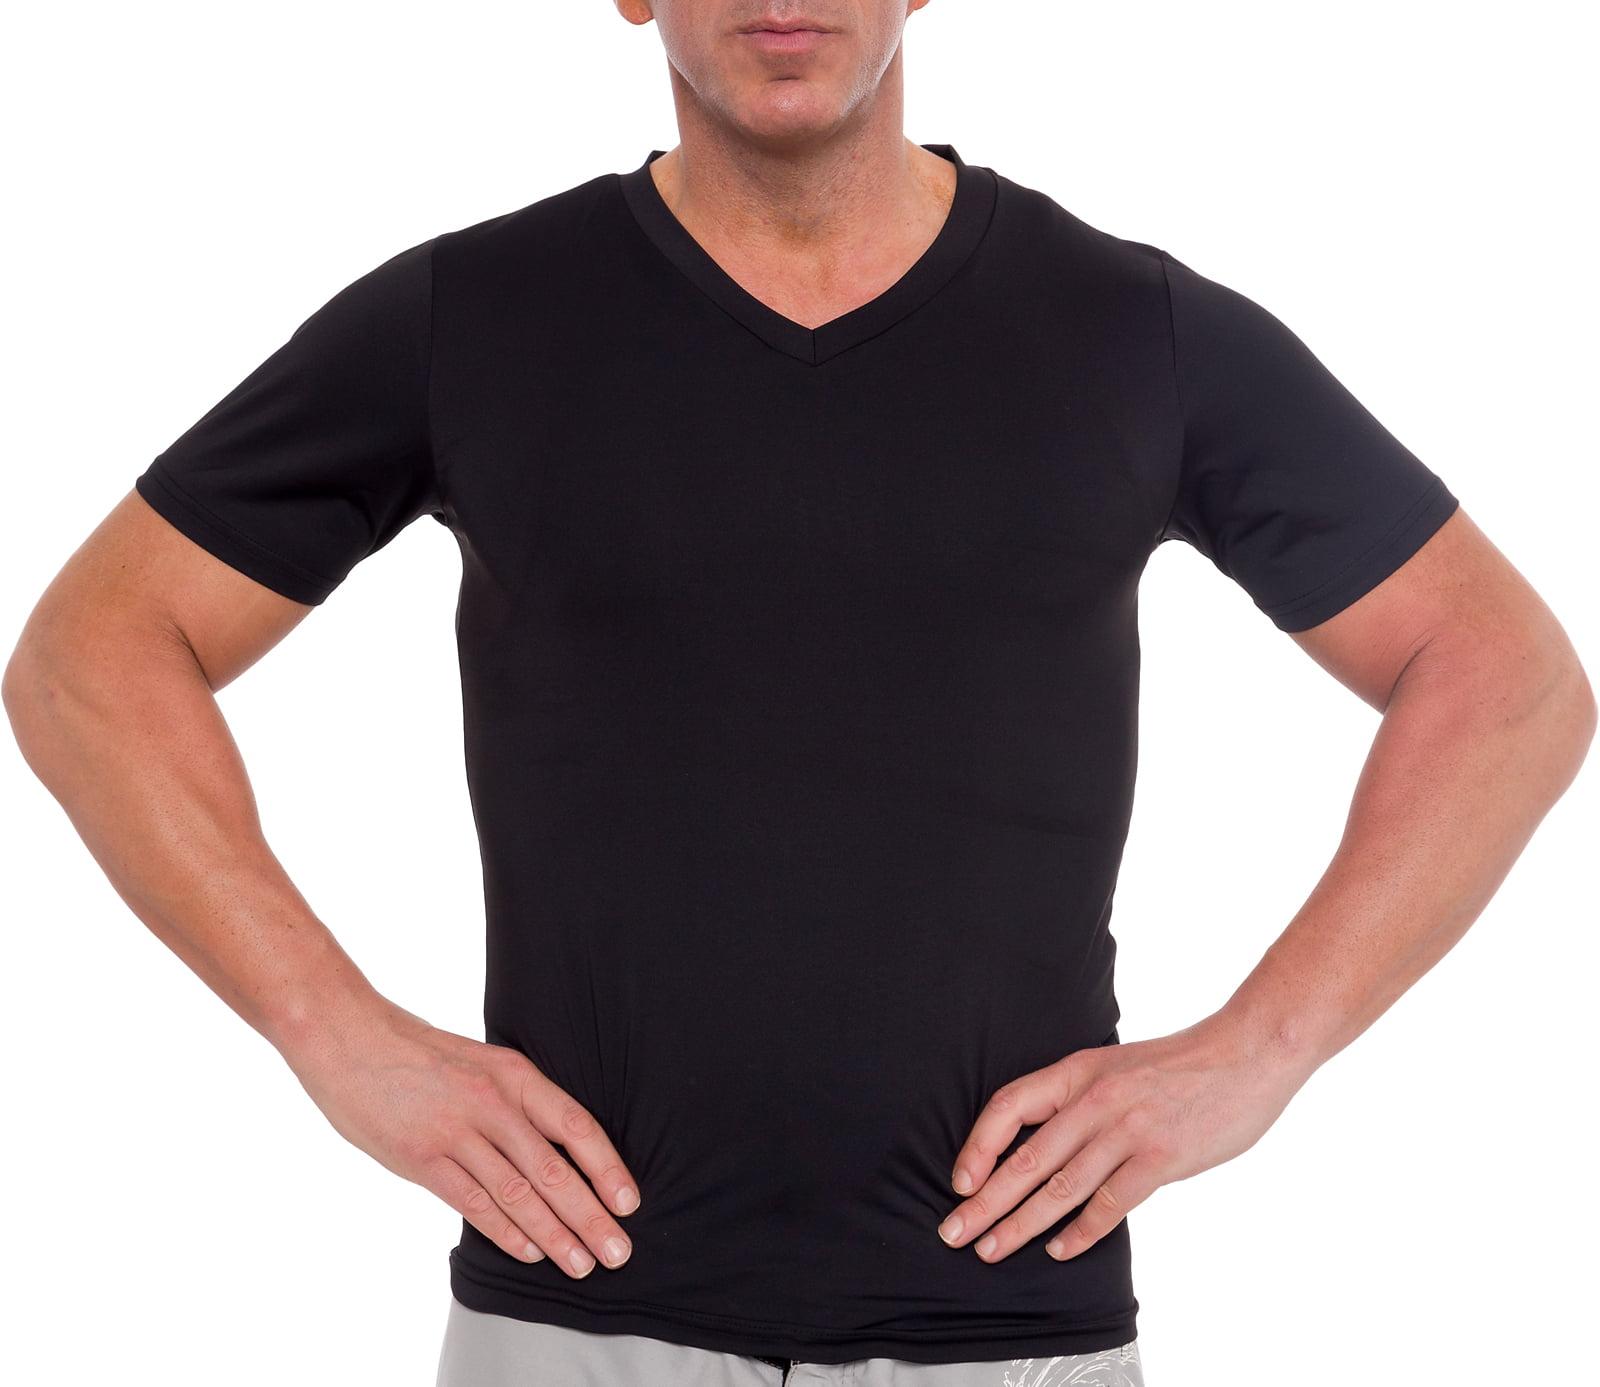 Legou Mens Solid V-Neck Slim Plus Elasticity Underwear Tops